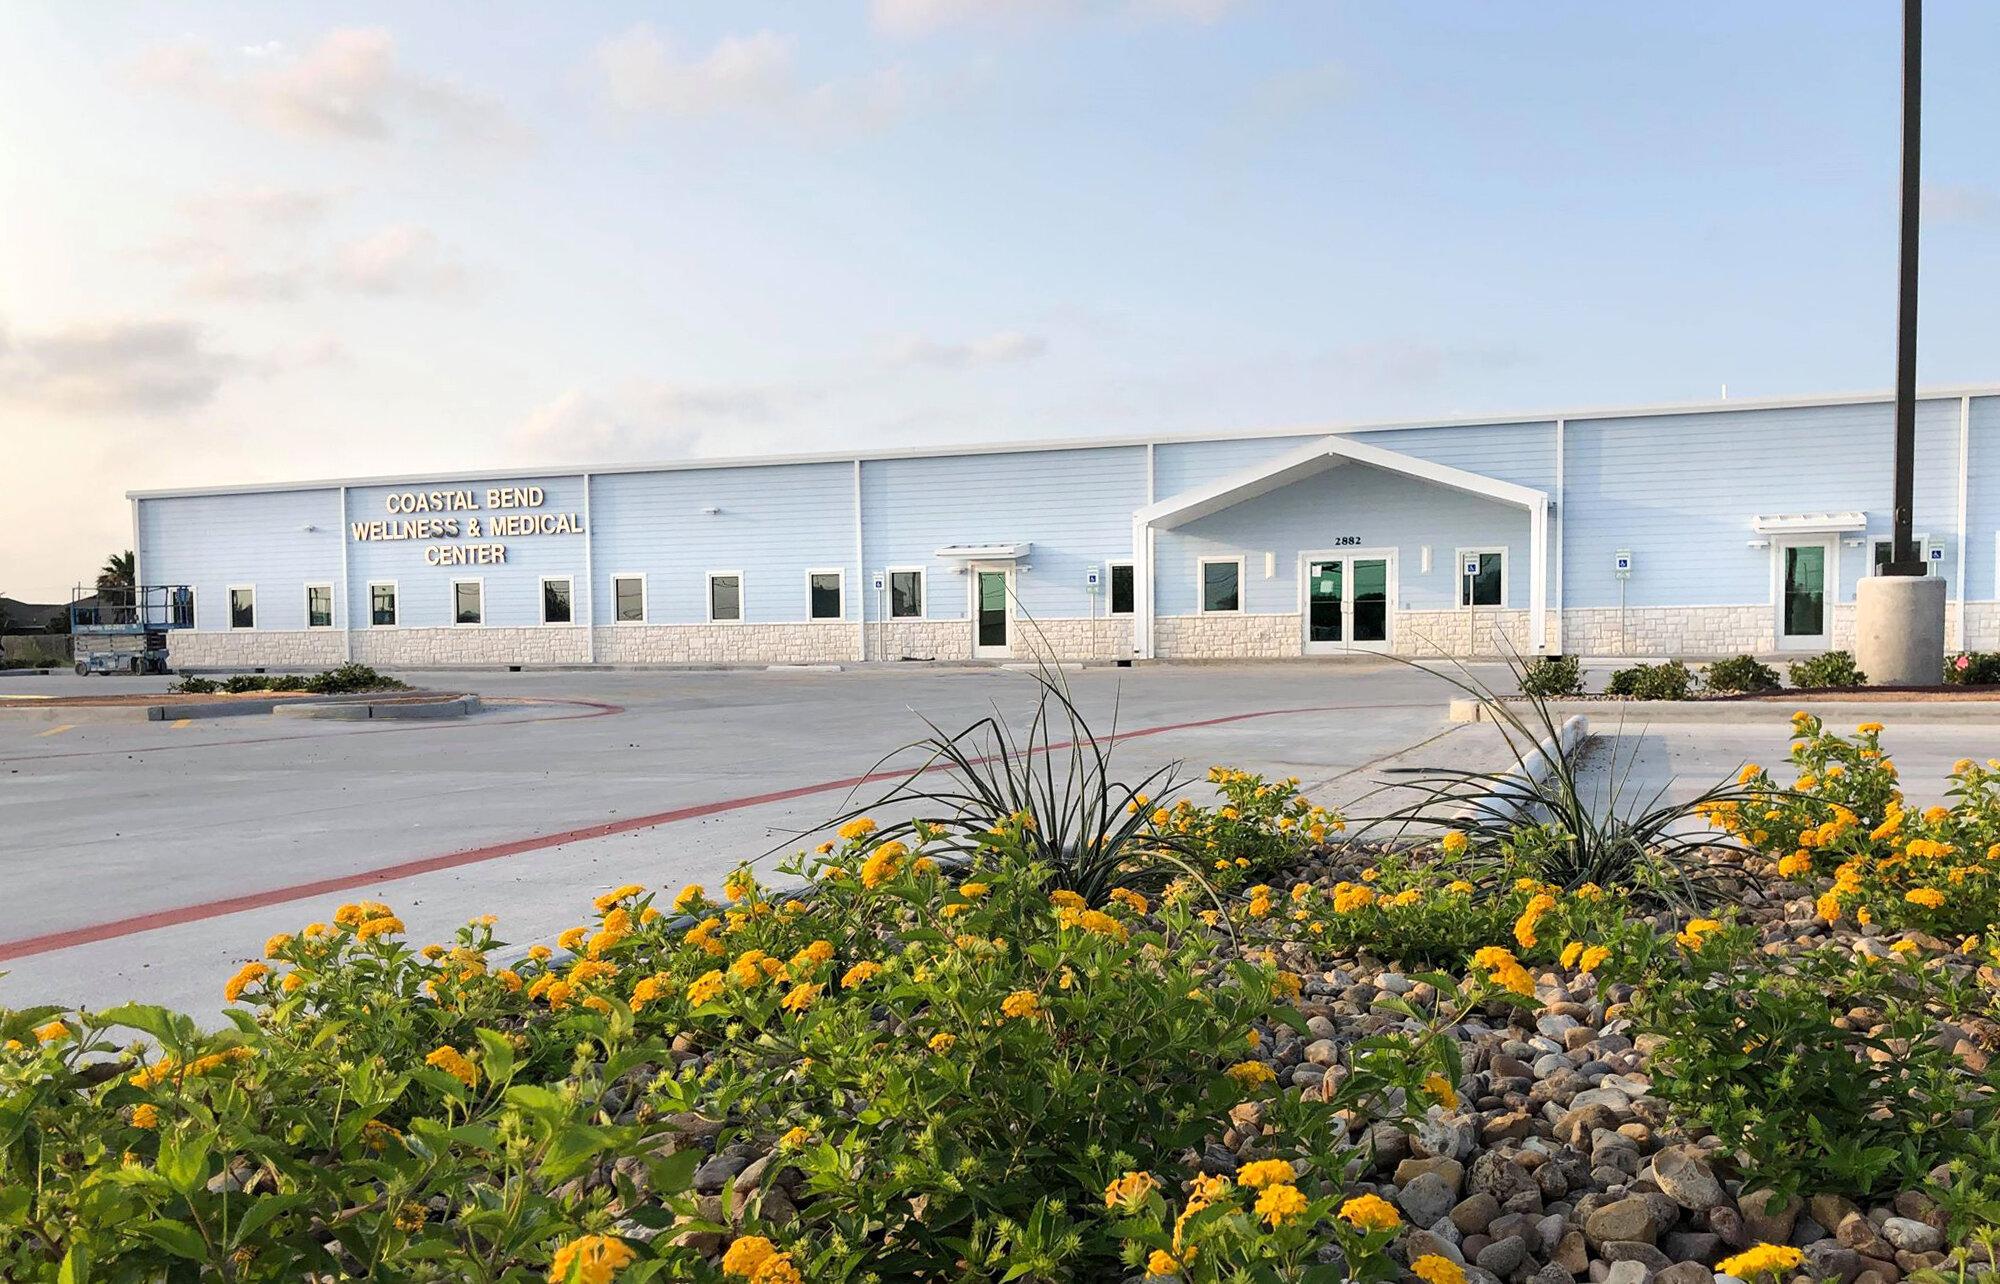 Coastal Bend Wellness Foundation - Community Health Center